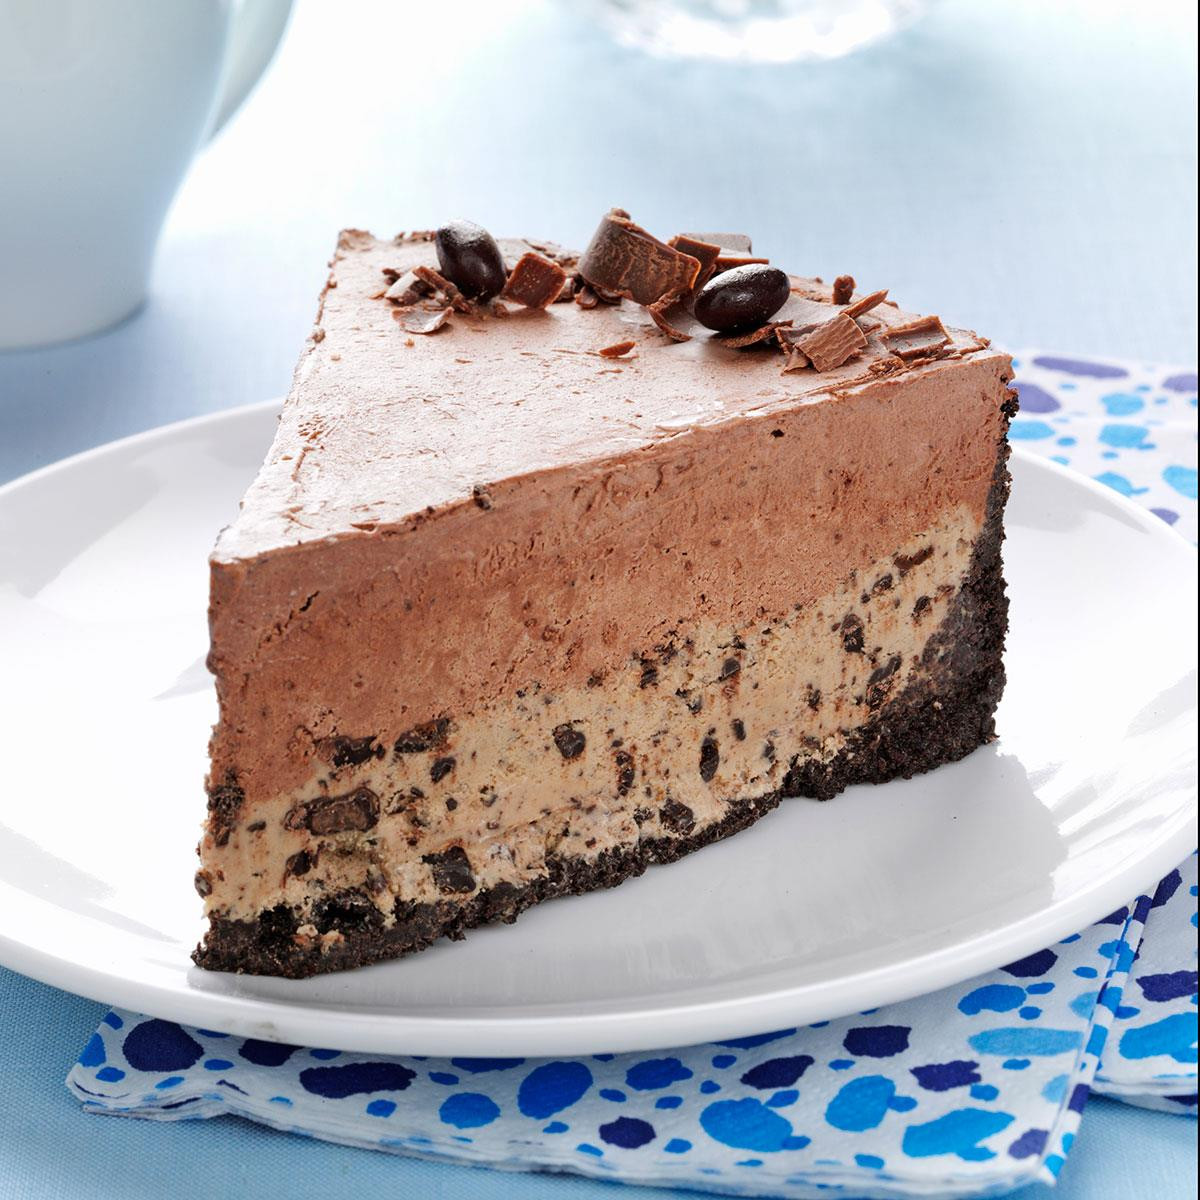 Chocolate Ice Cream Cake  Chocolate Coffee Bean Ice Cream Cake Recipe